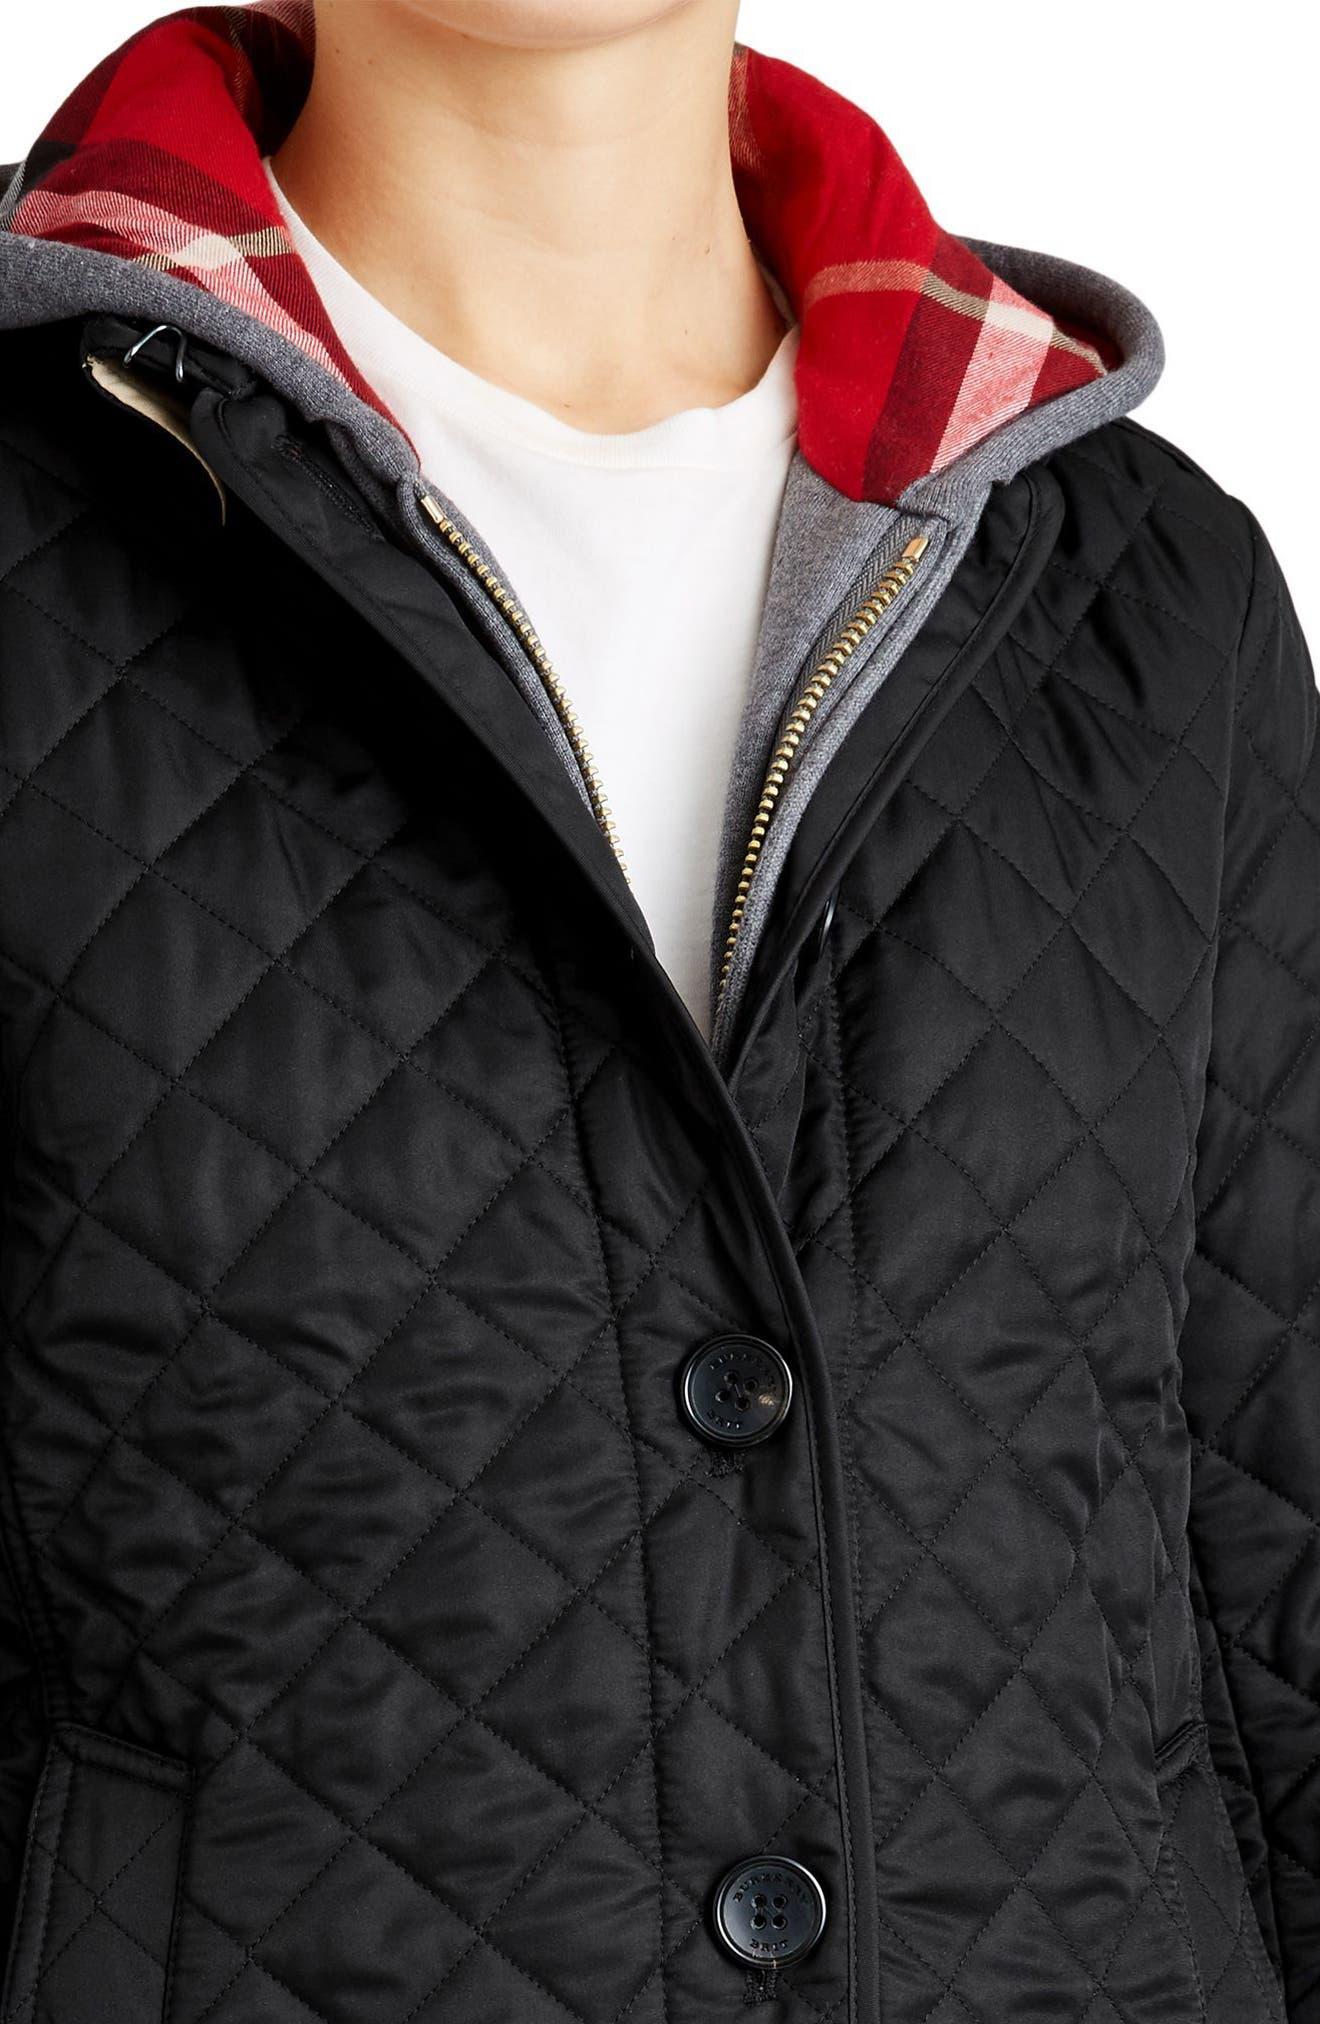 Ashurst Quilted Jacket,                             Alternate thumbnail 4, color,                             BLACK